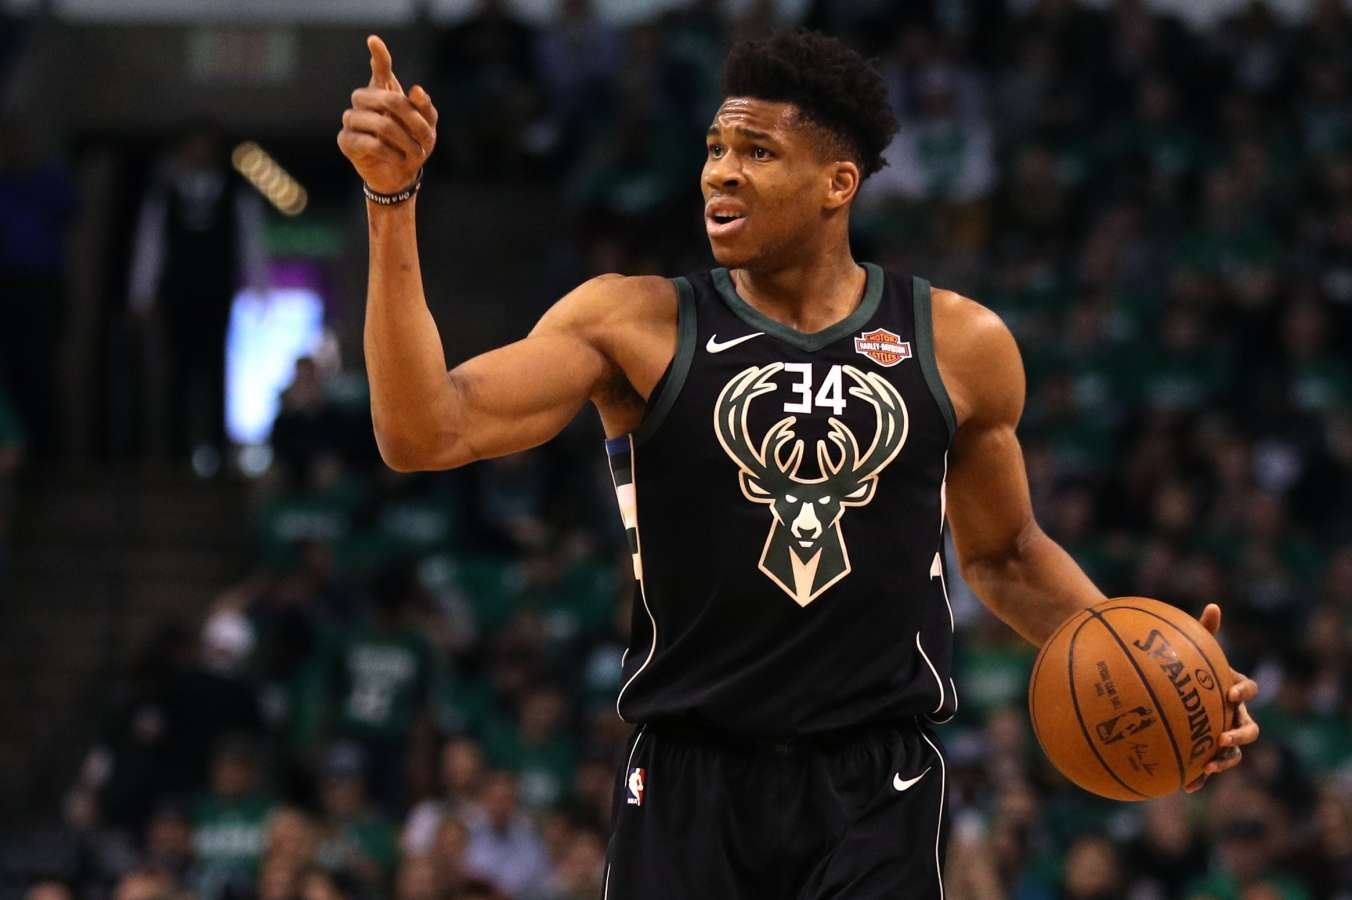 NBA Playoffs Saturday April 21: Best Bets